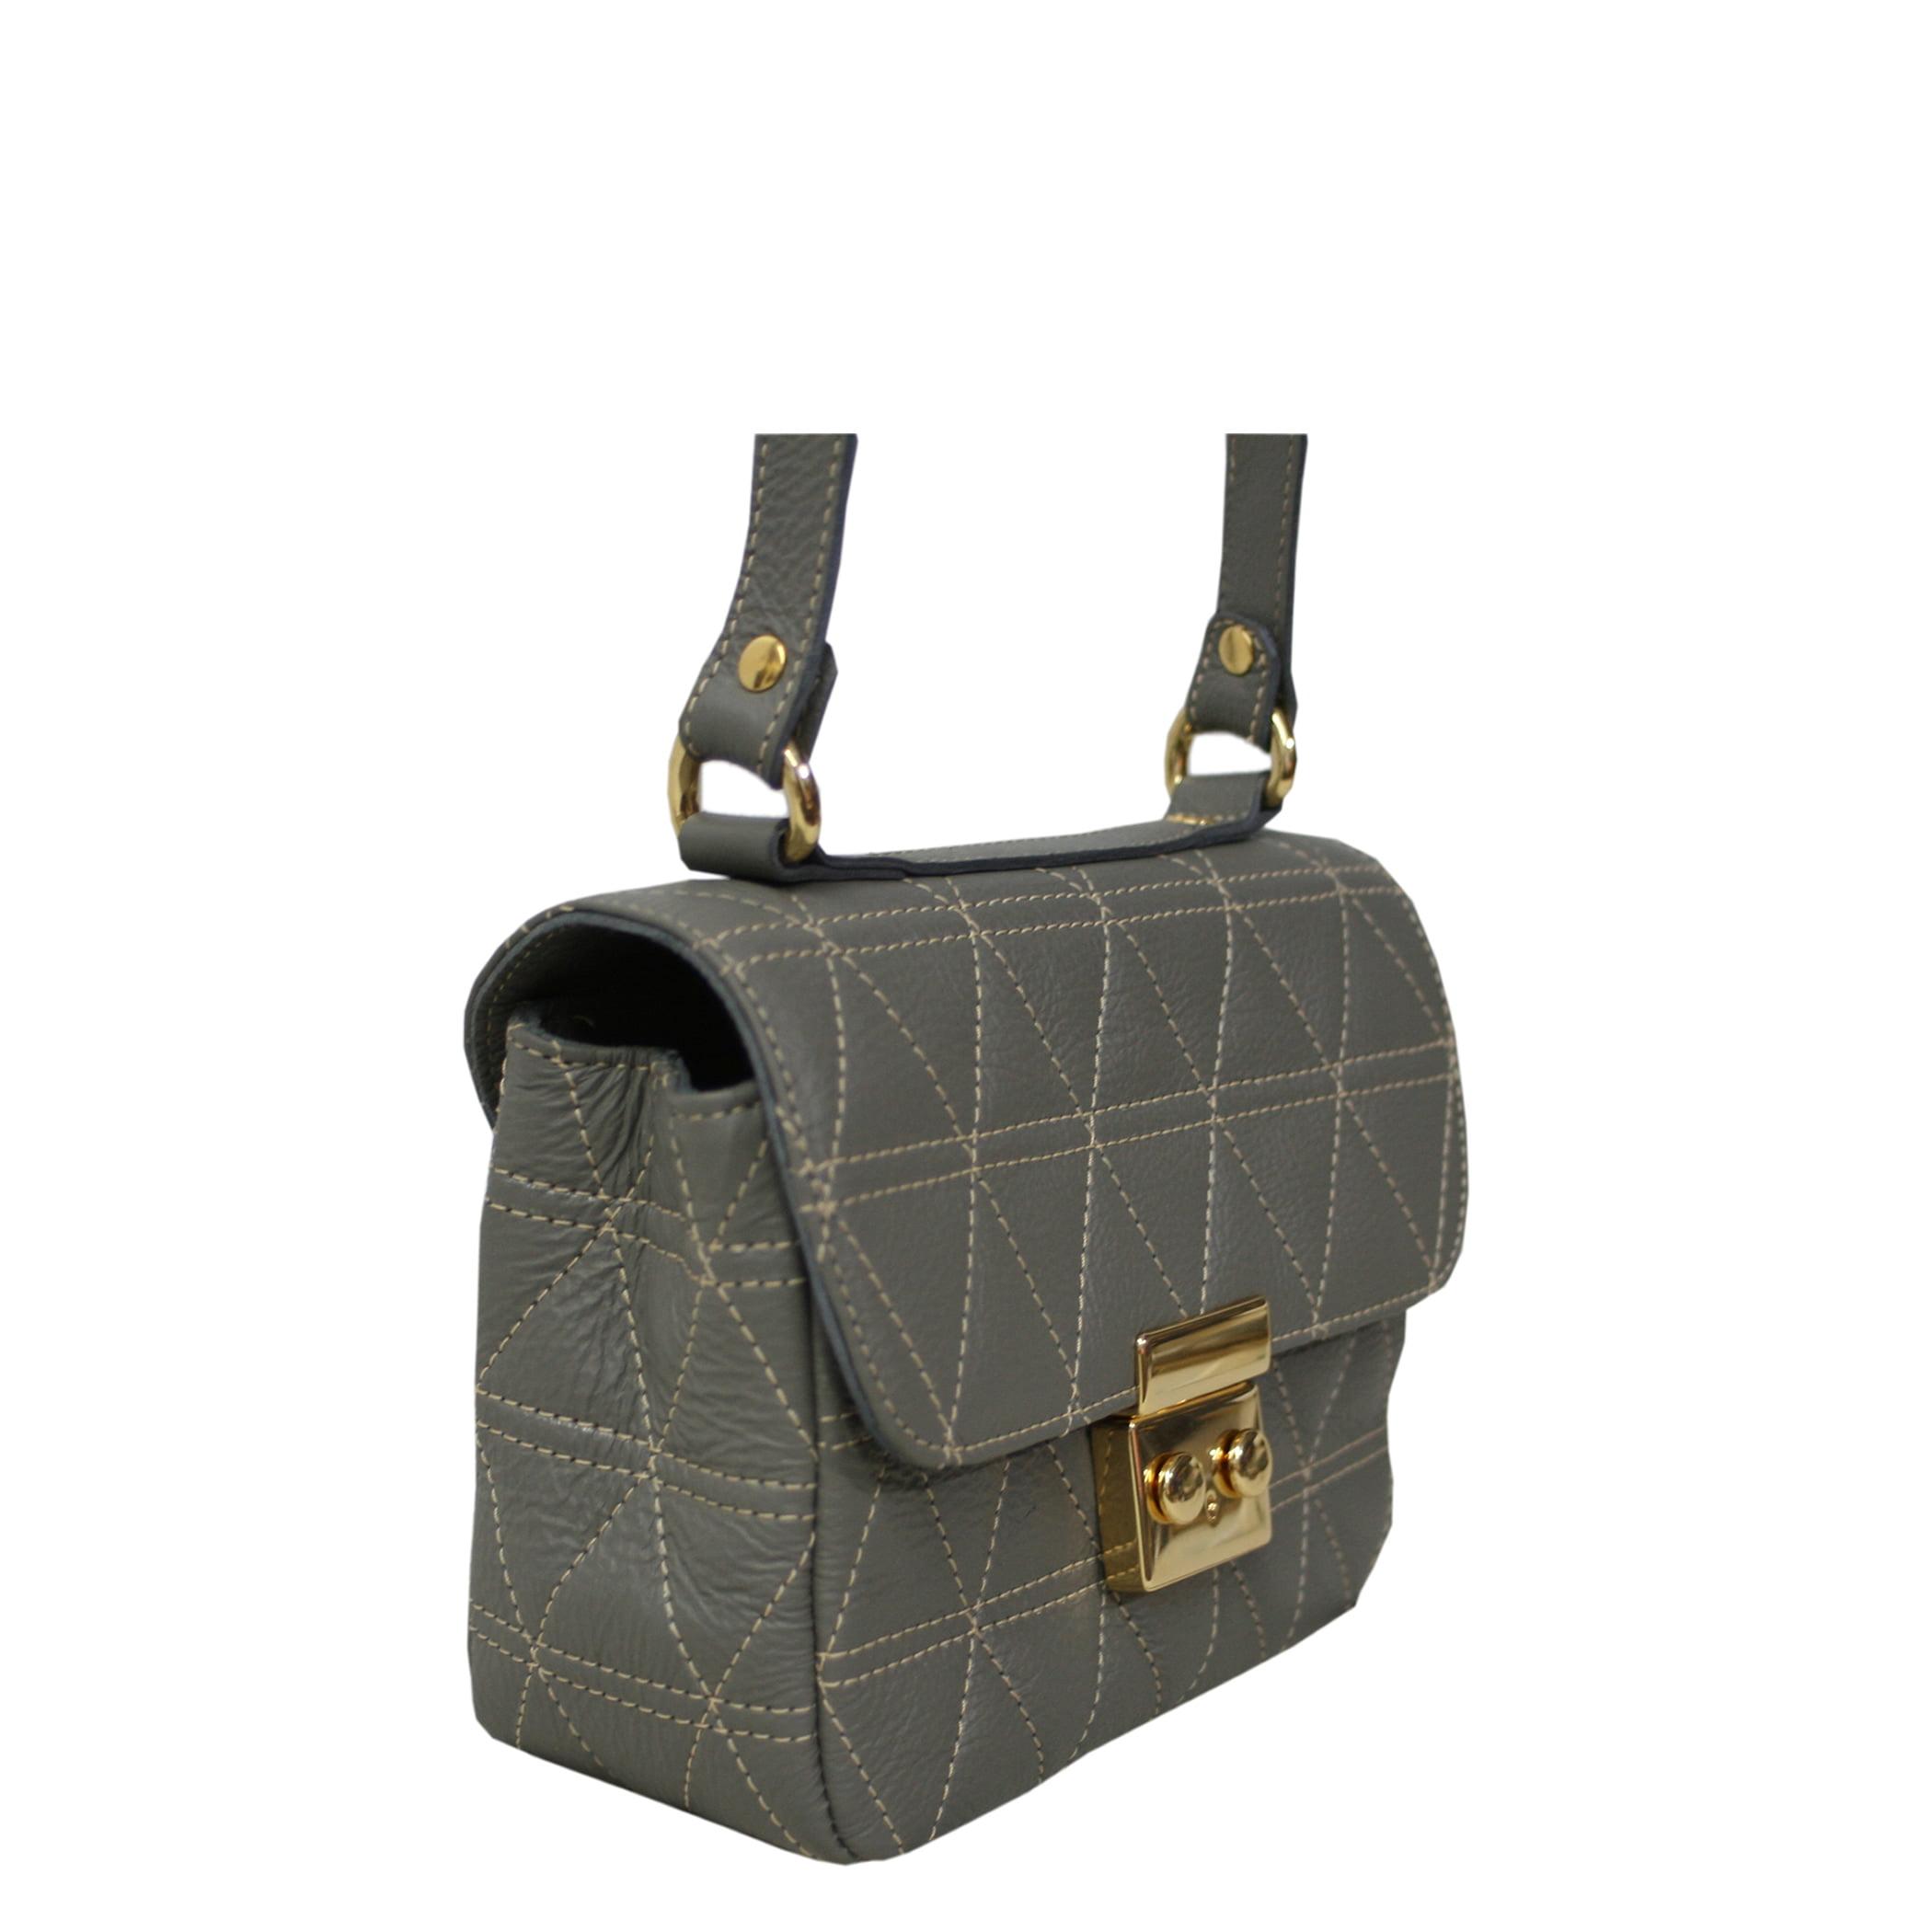 Bolsa transversal matelassê cinza em couro Lyra